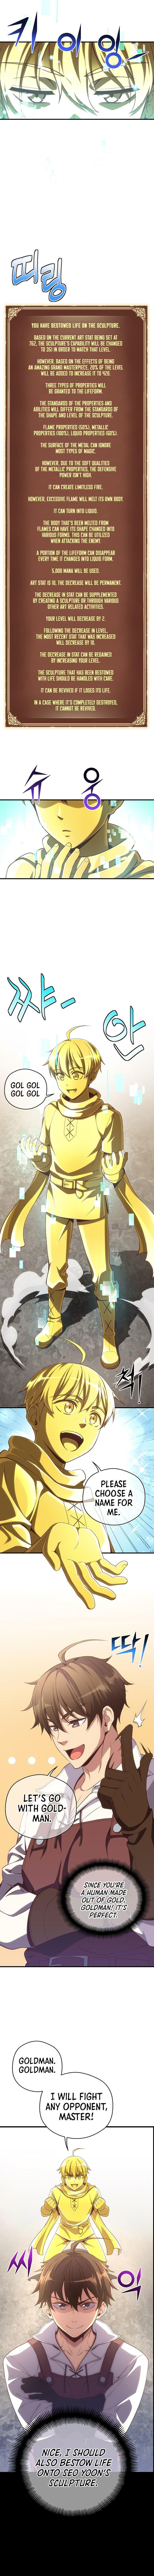 The Legendary Moonlight Sculptor Chapter 164 page 6 - Mangakakalots.com